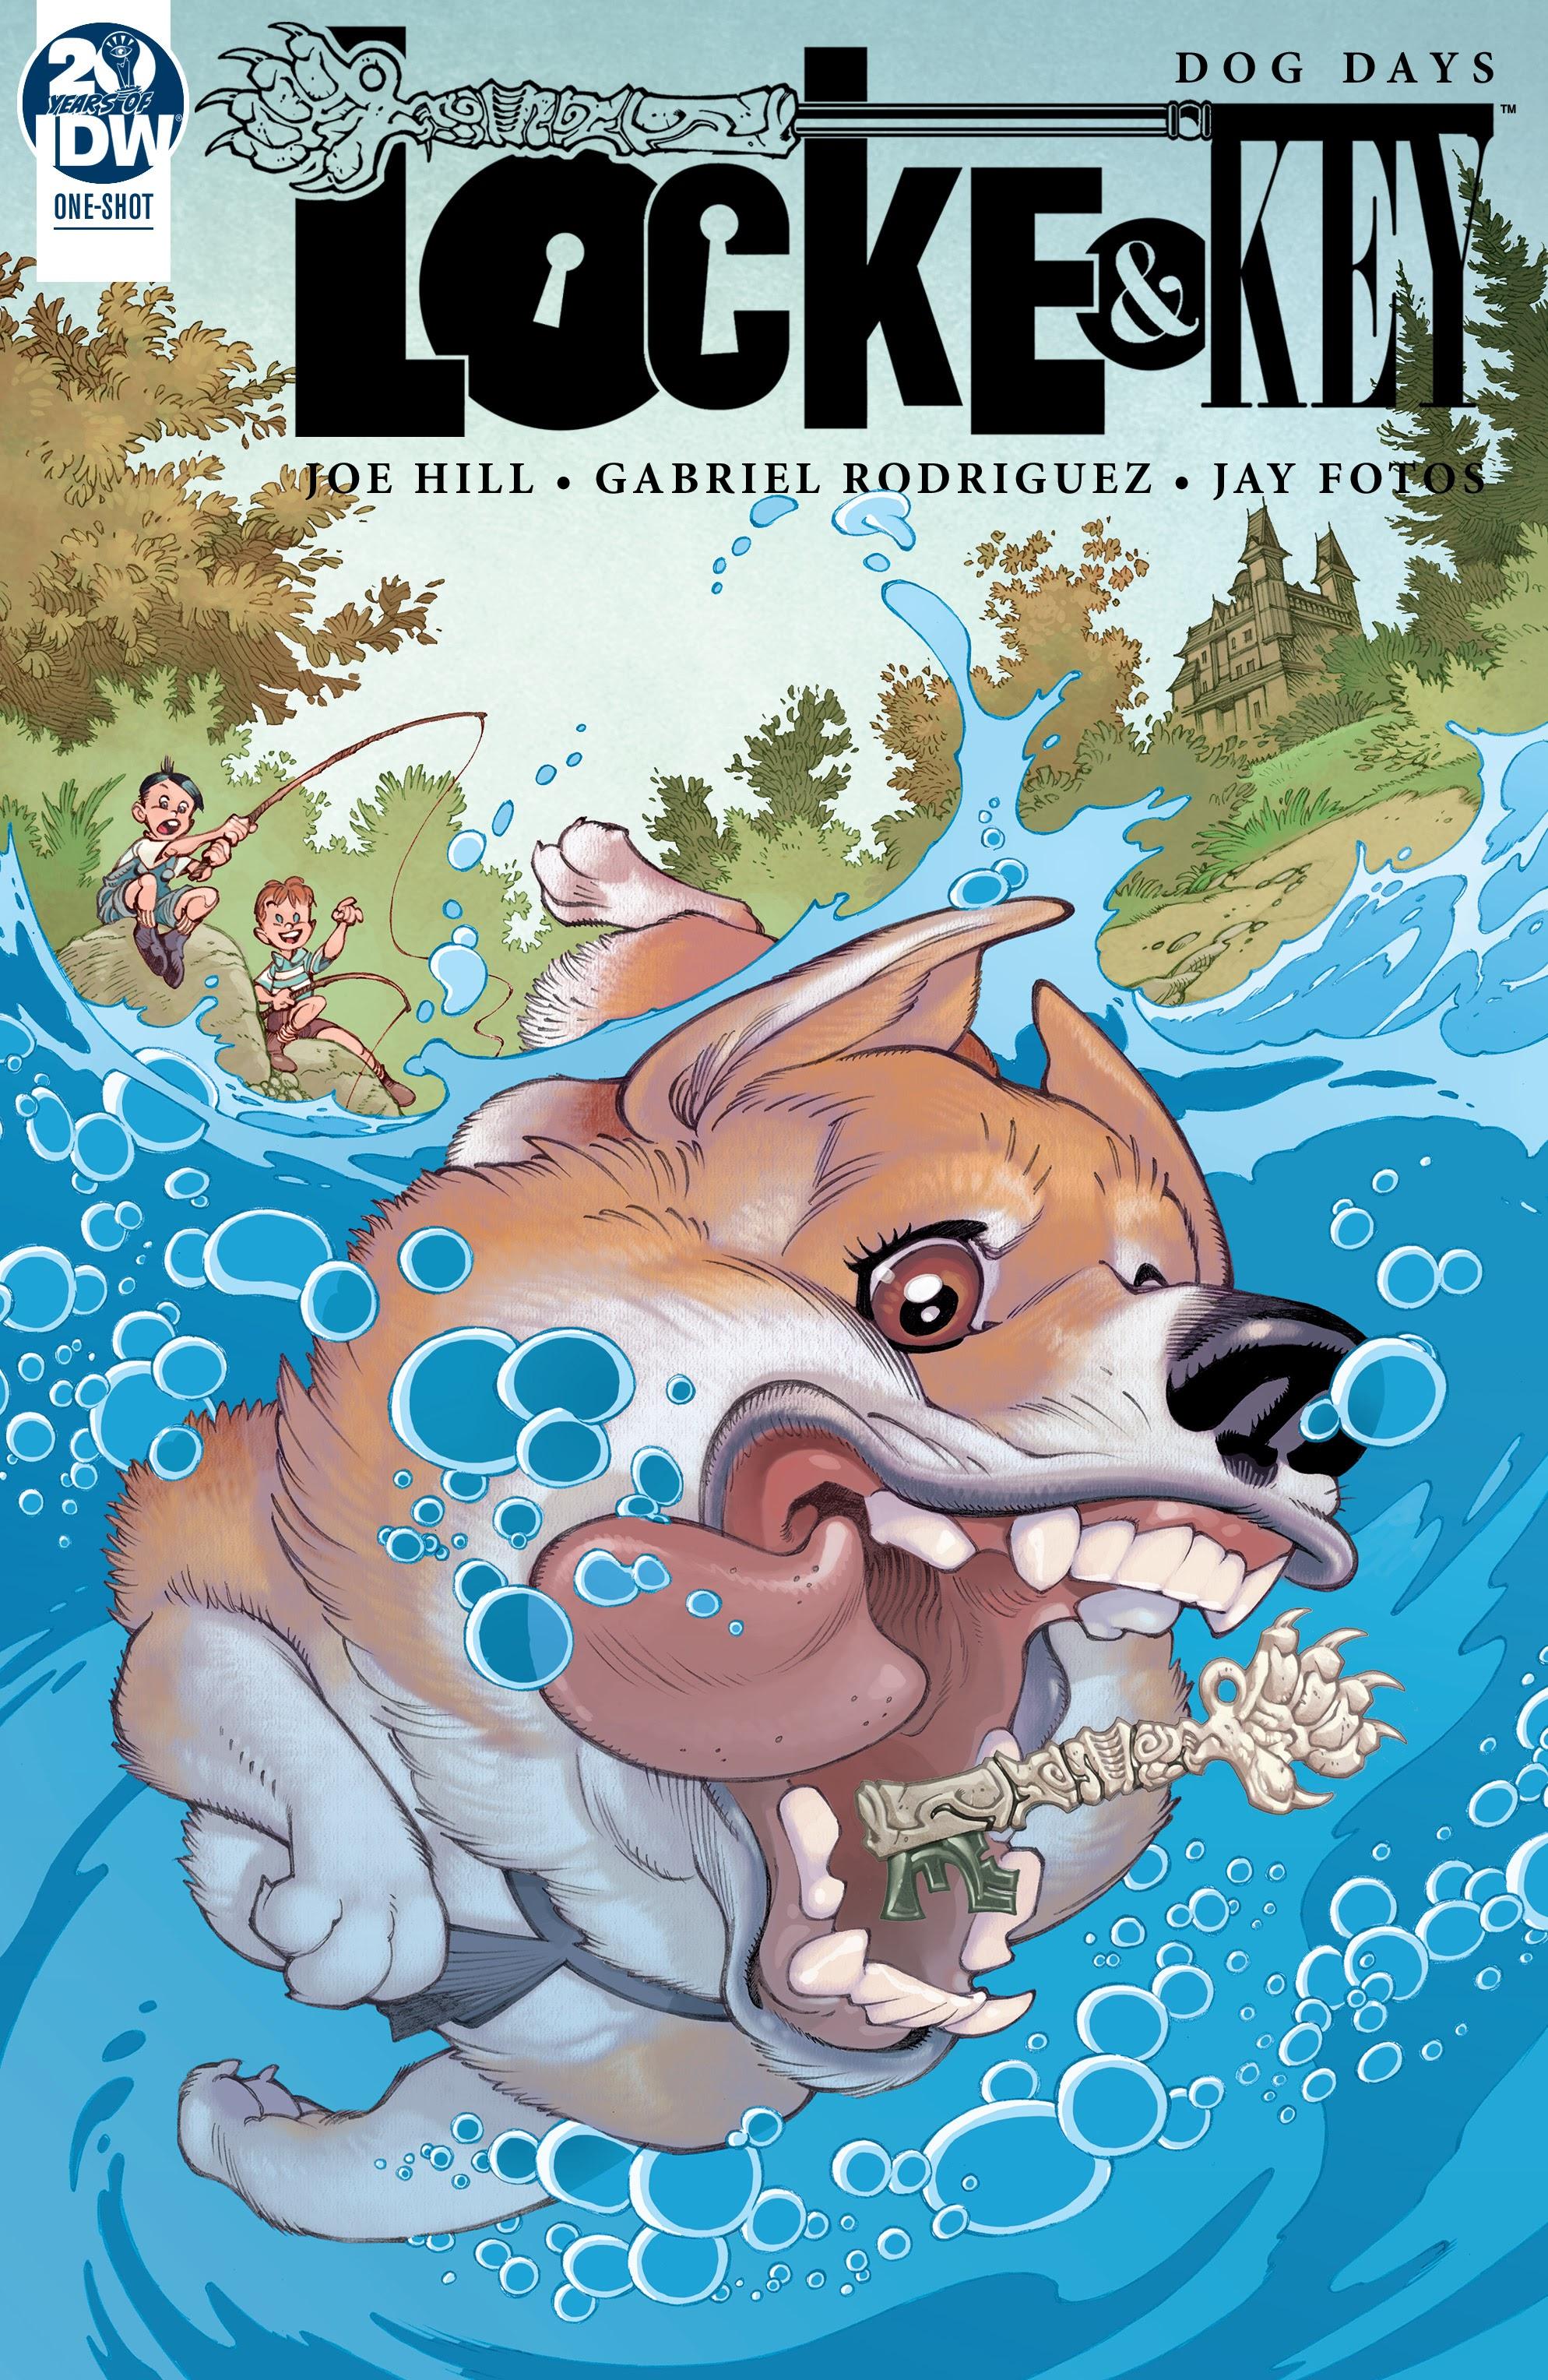 Locke and Key: Dog Days Full Page 1